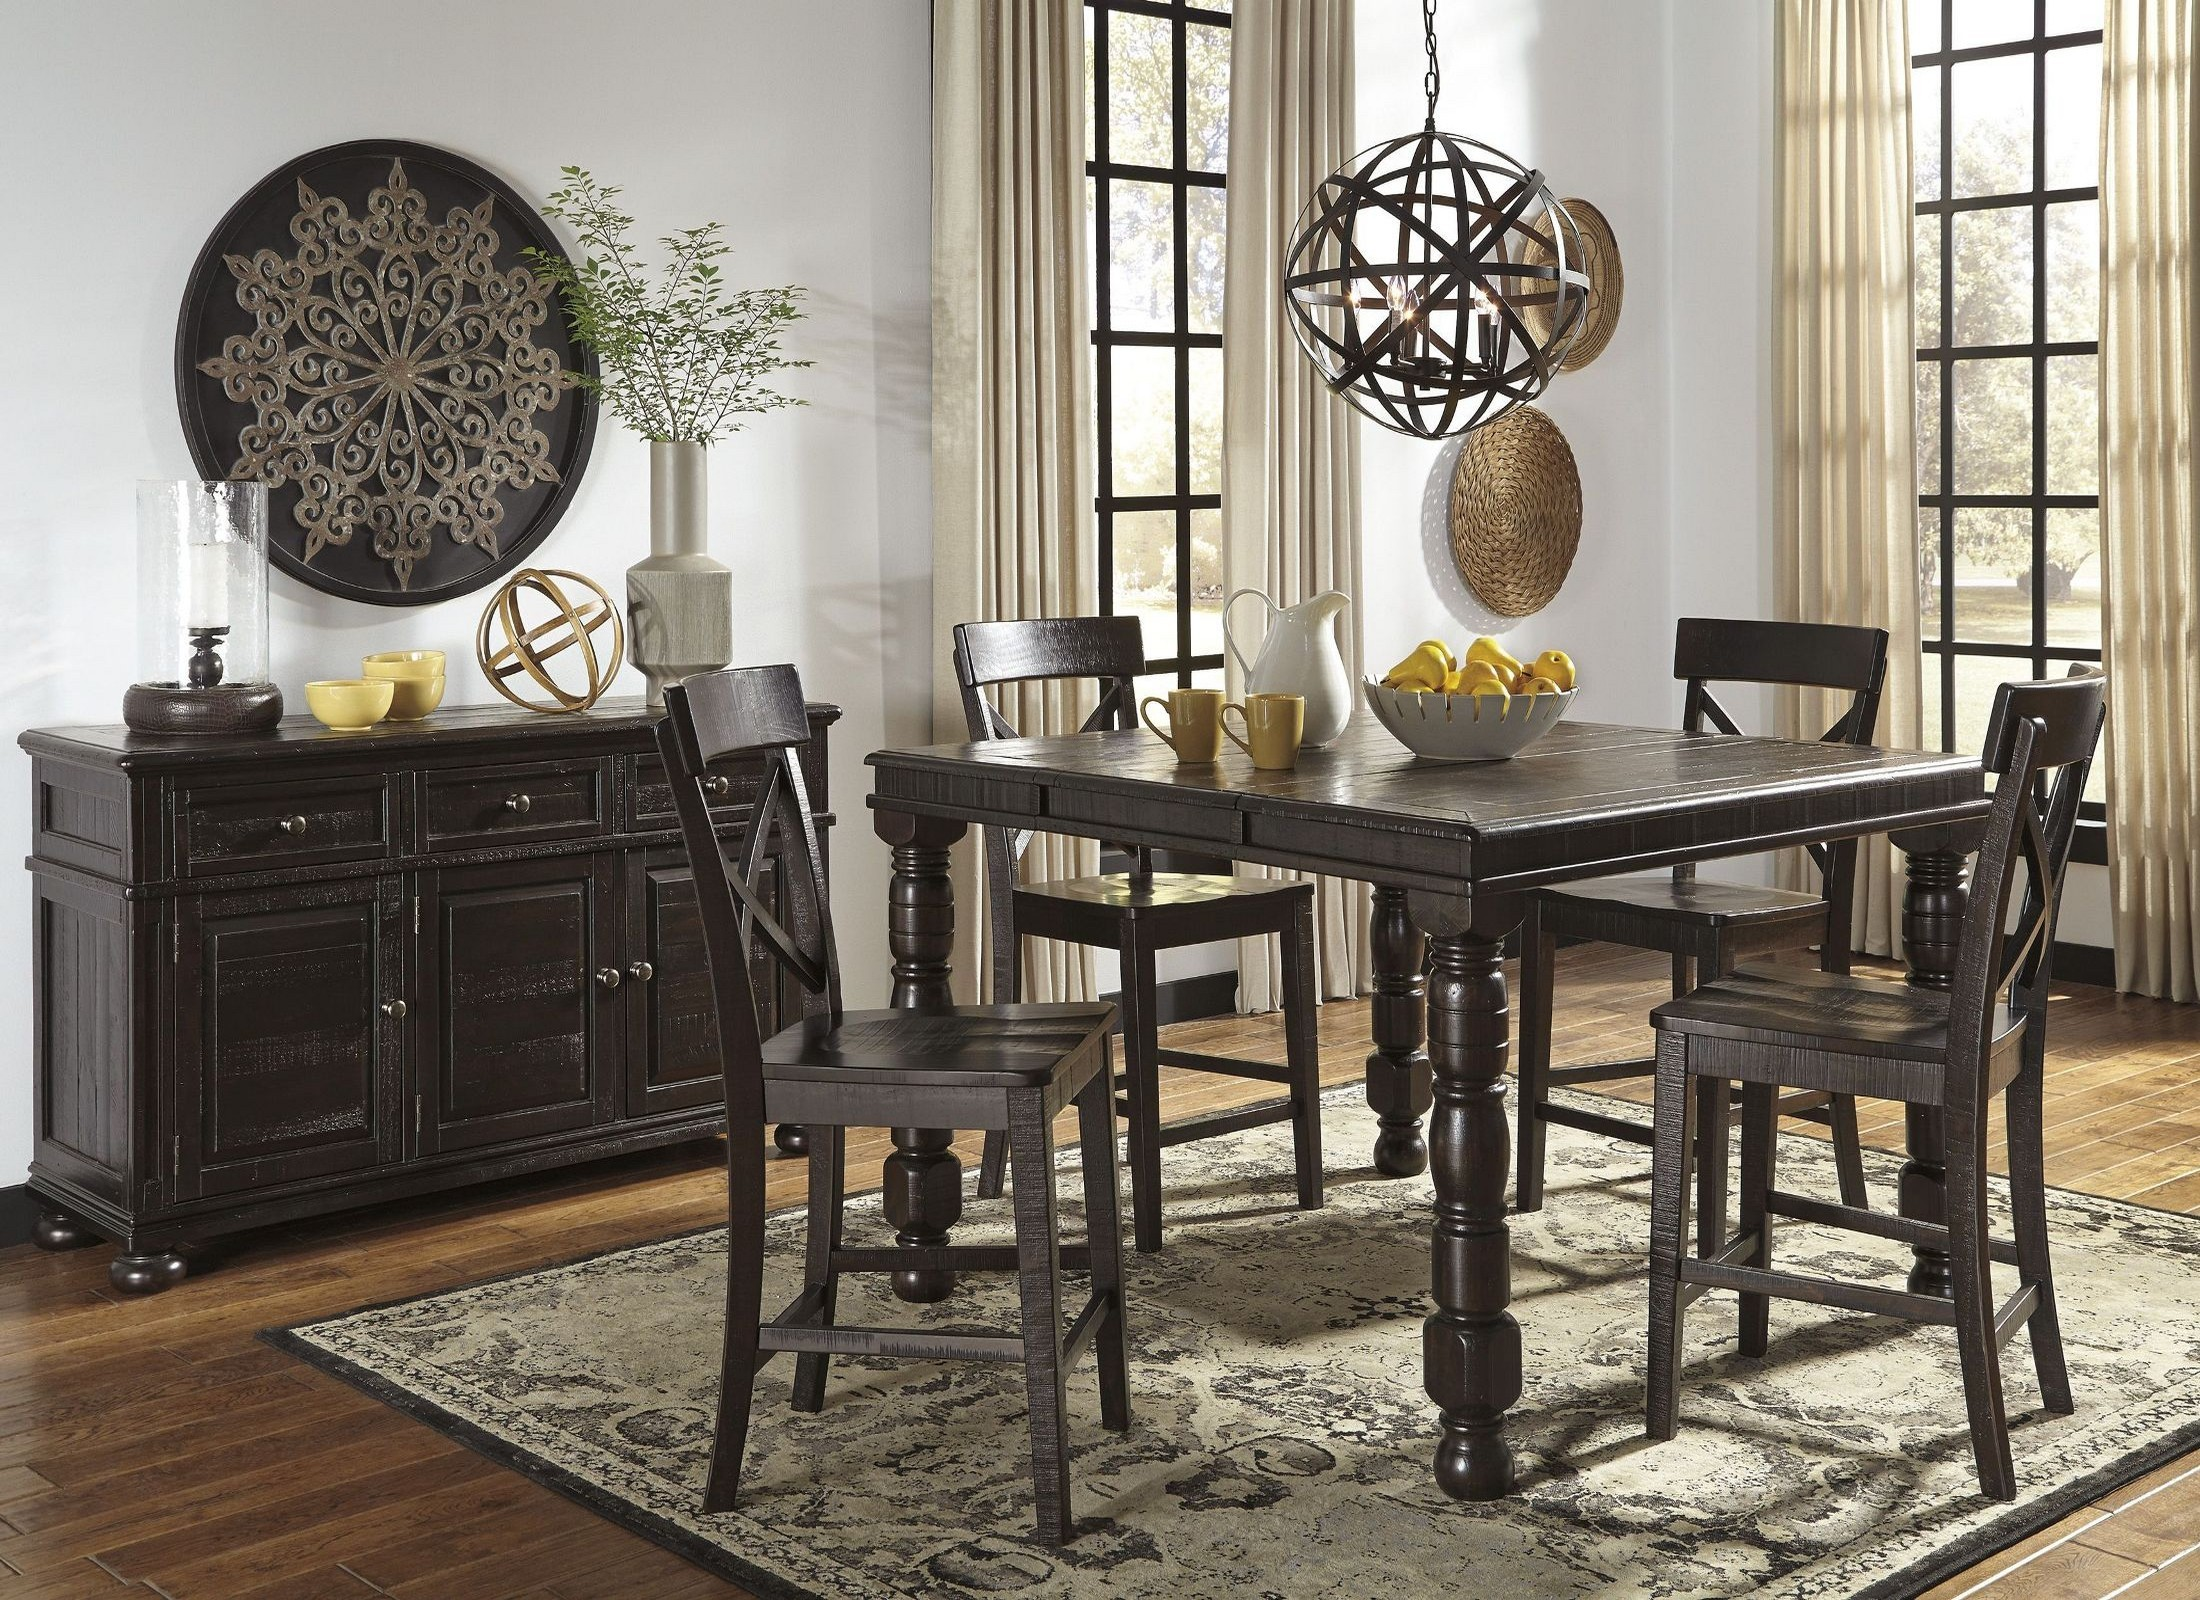 Brown Dining Room Set Of Gerlane Dark Brown Rectangular Counter Height Extendable